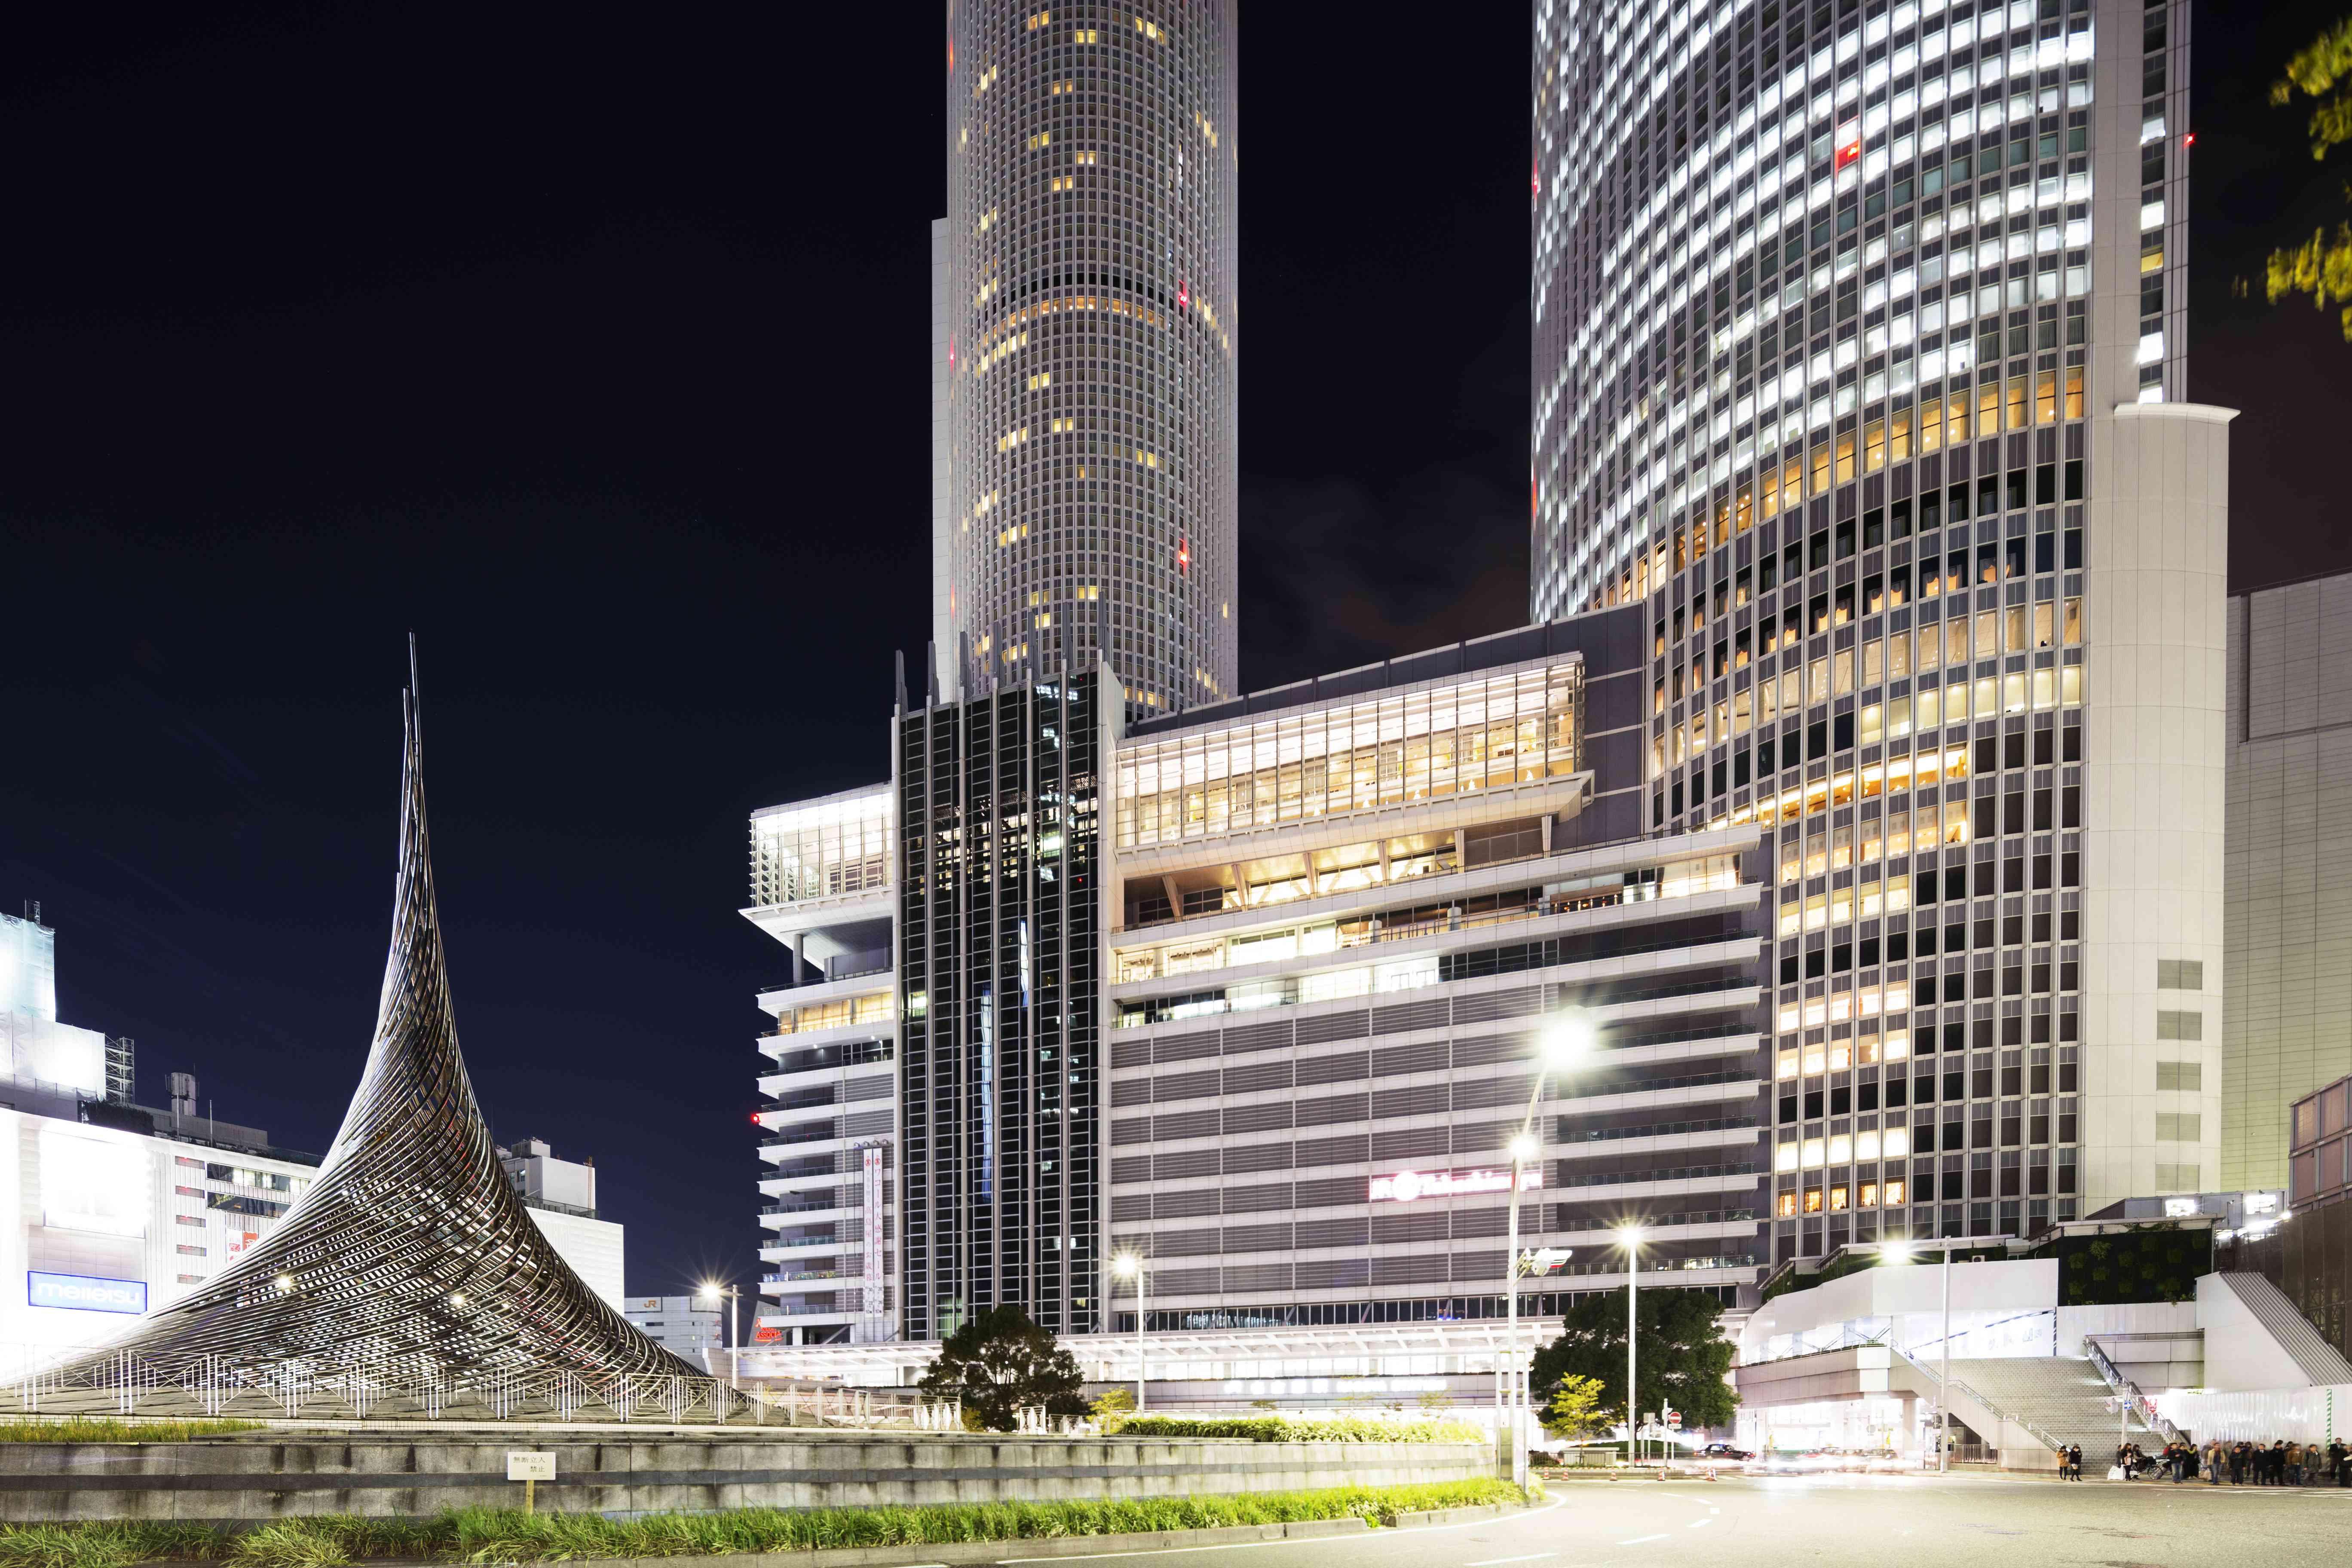 Nagoya train station building at night